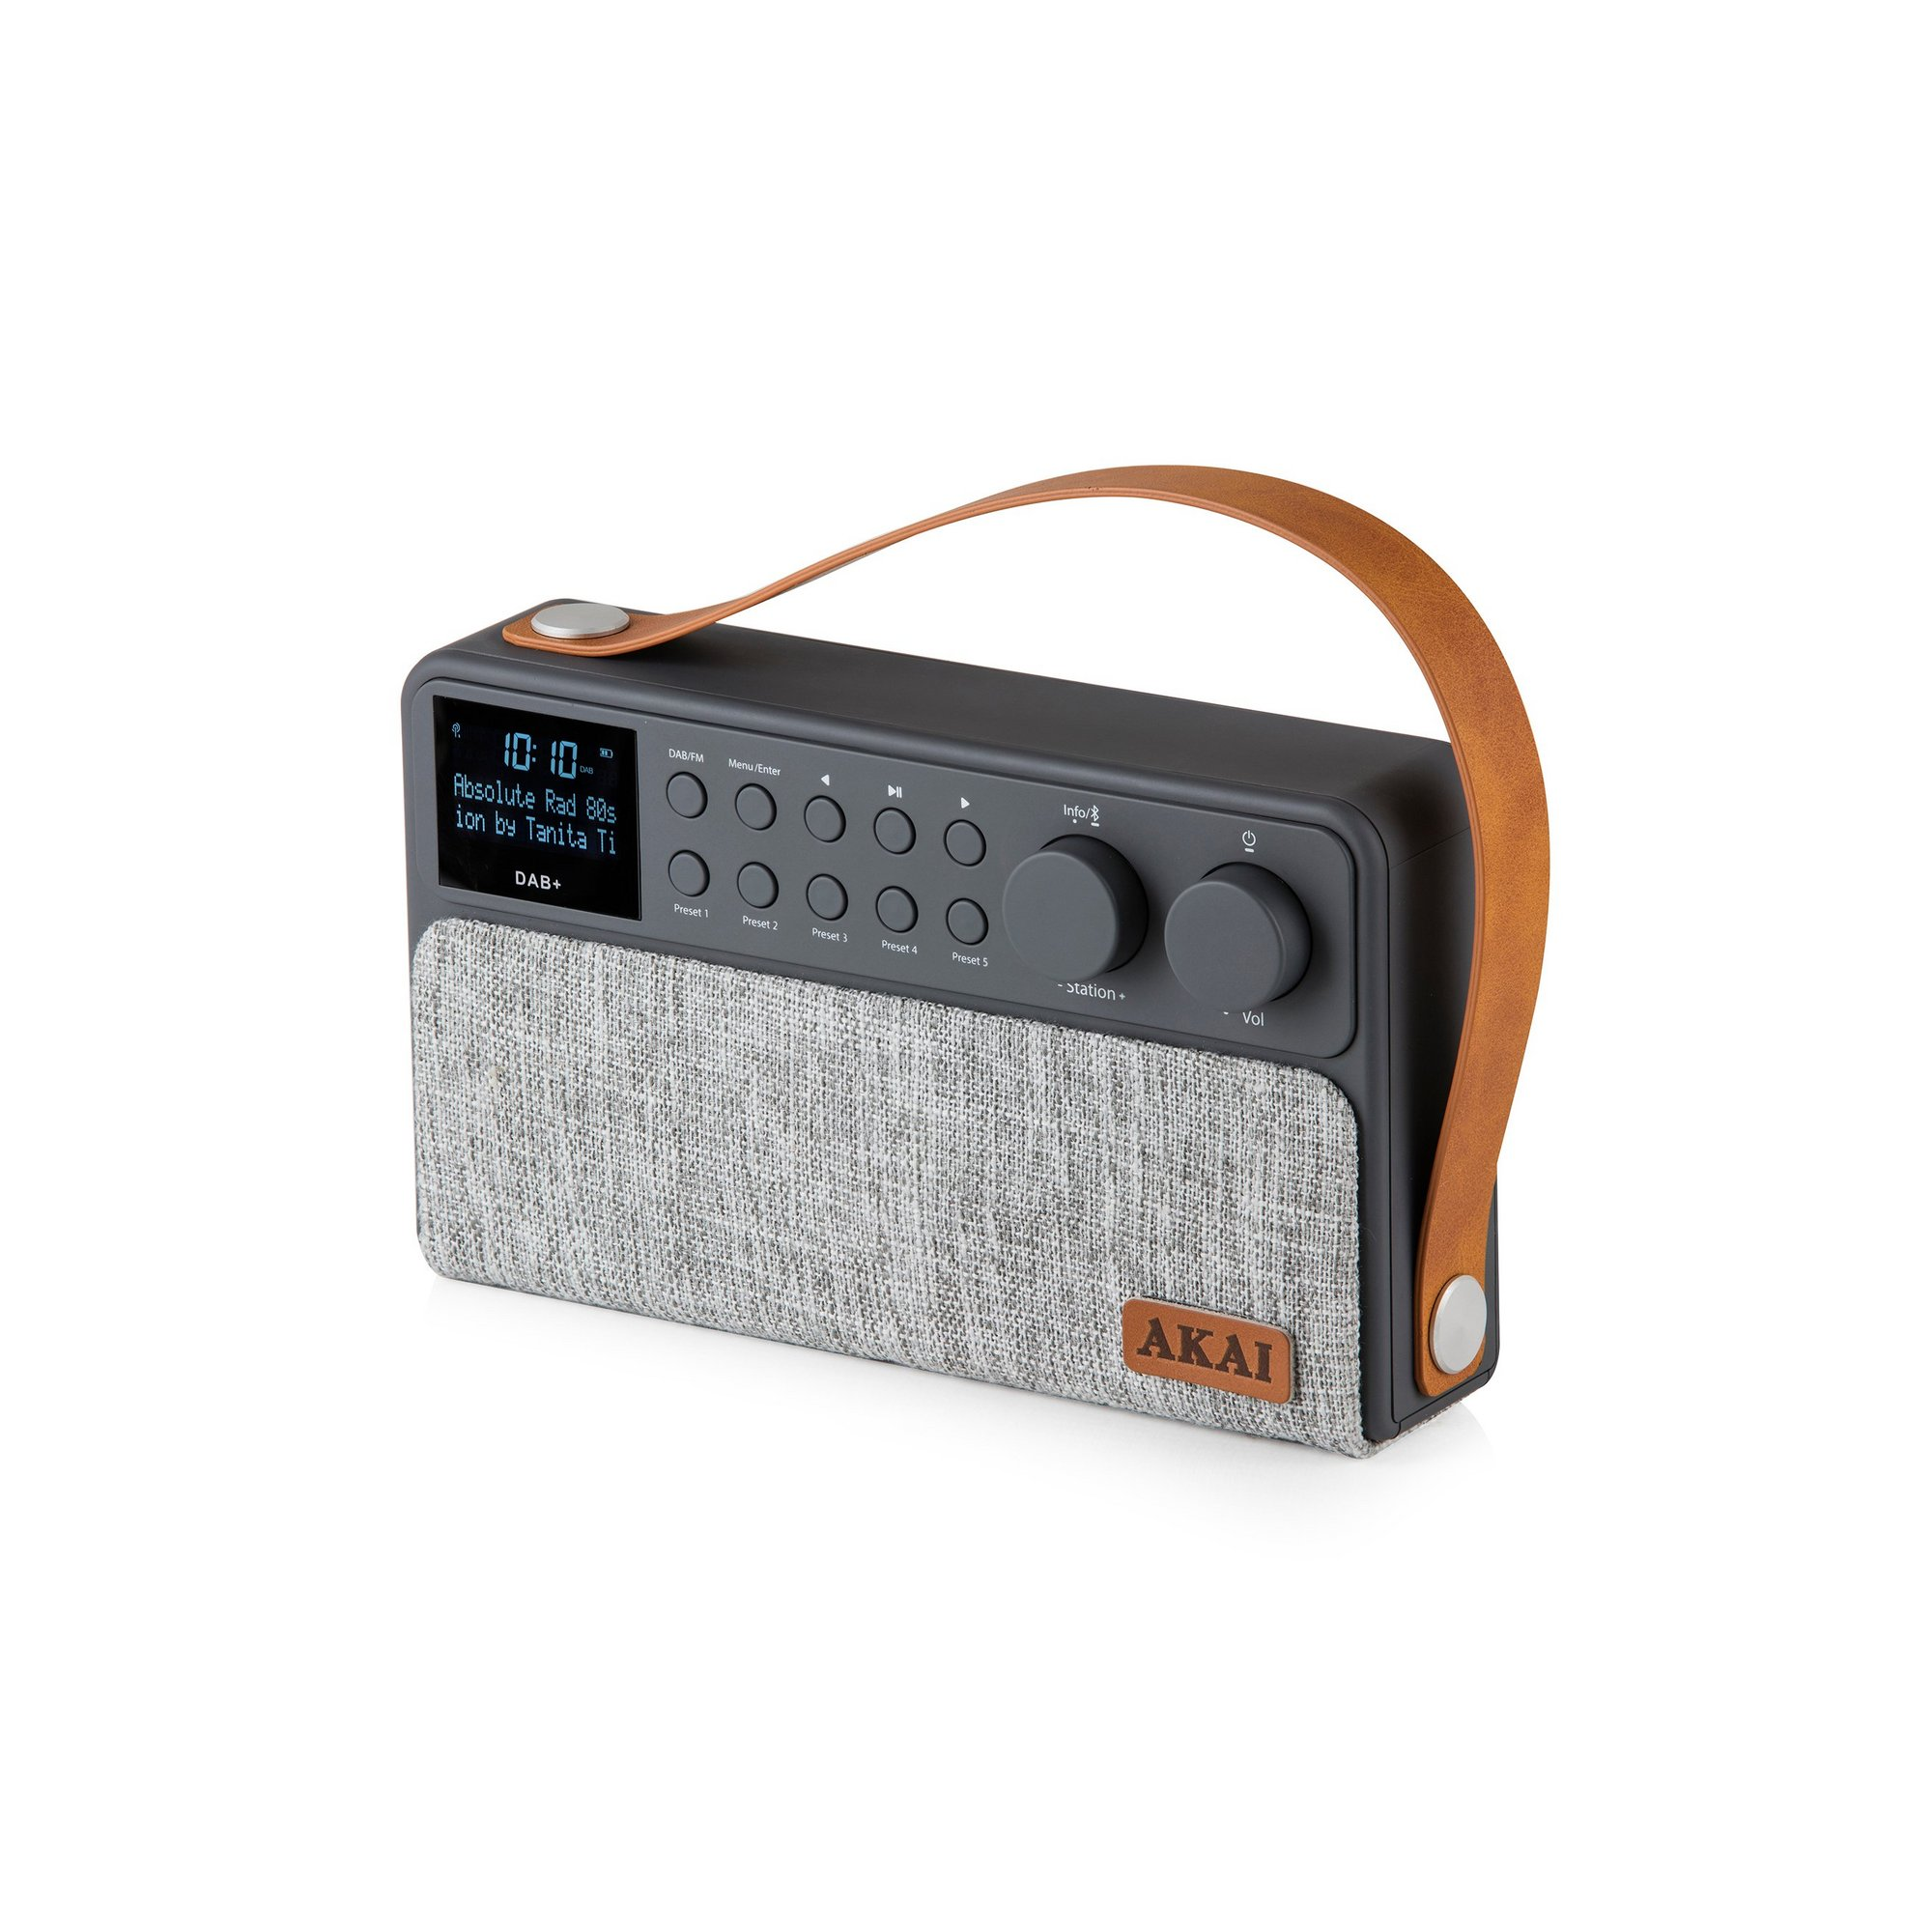 Image of Akai Sonisk Rechargeable DAB+ Radio